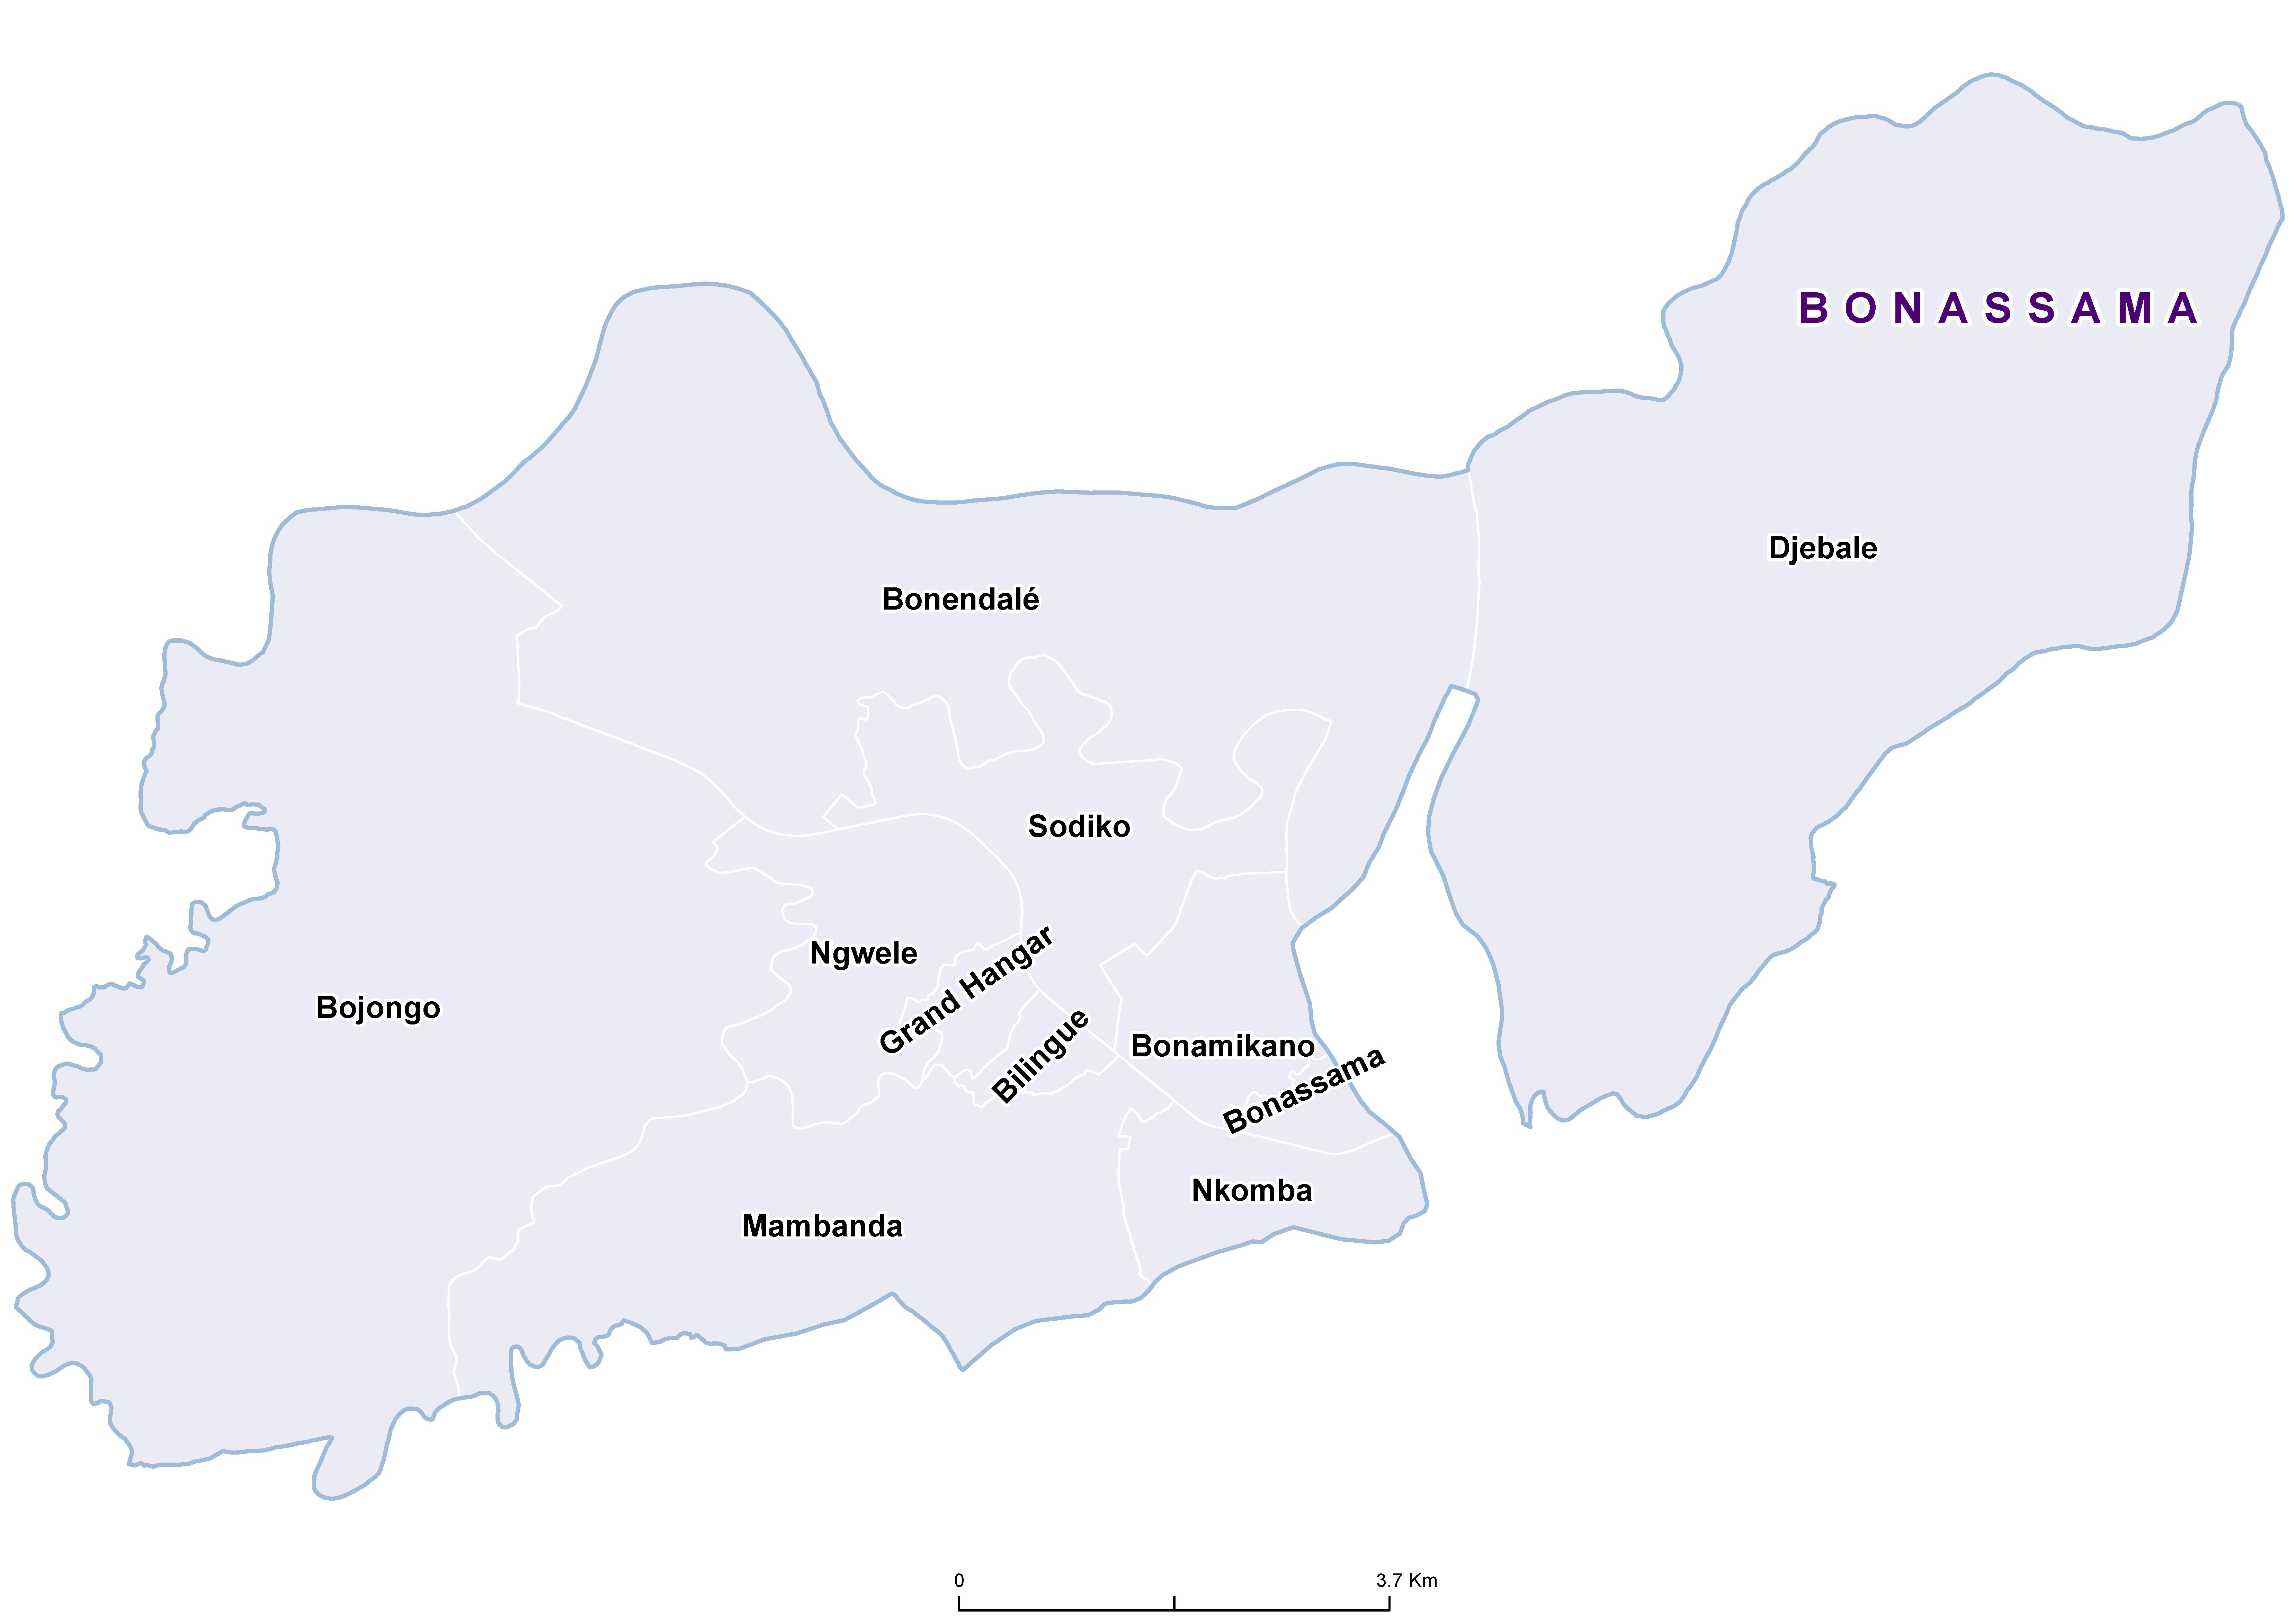 Bonassama STH 19850001